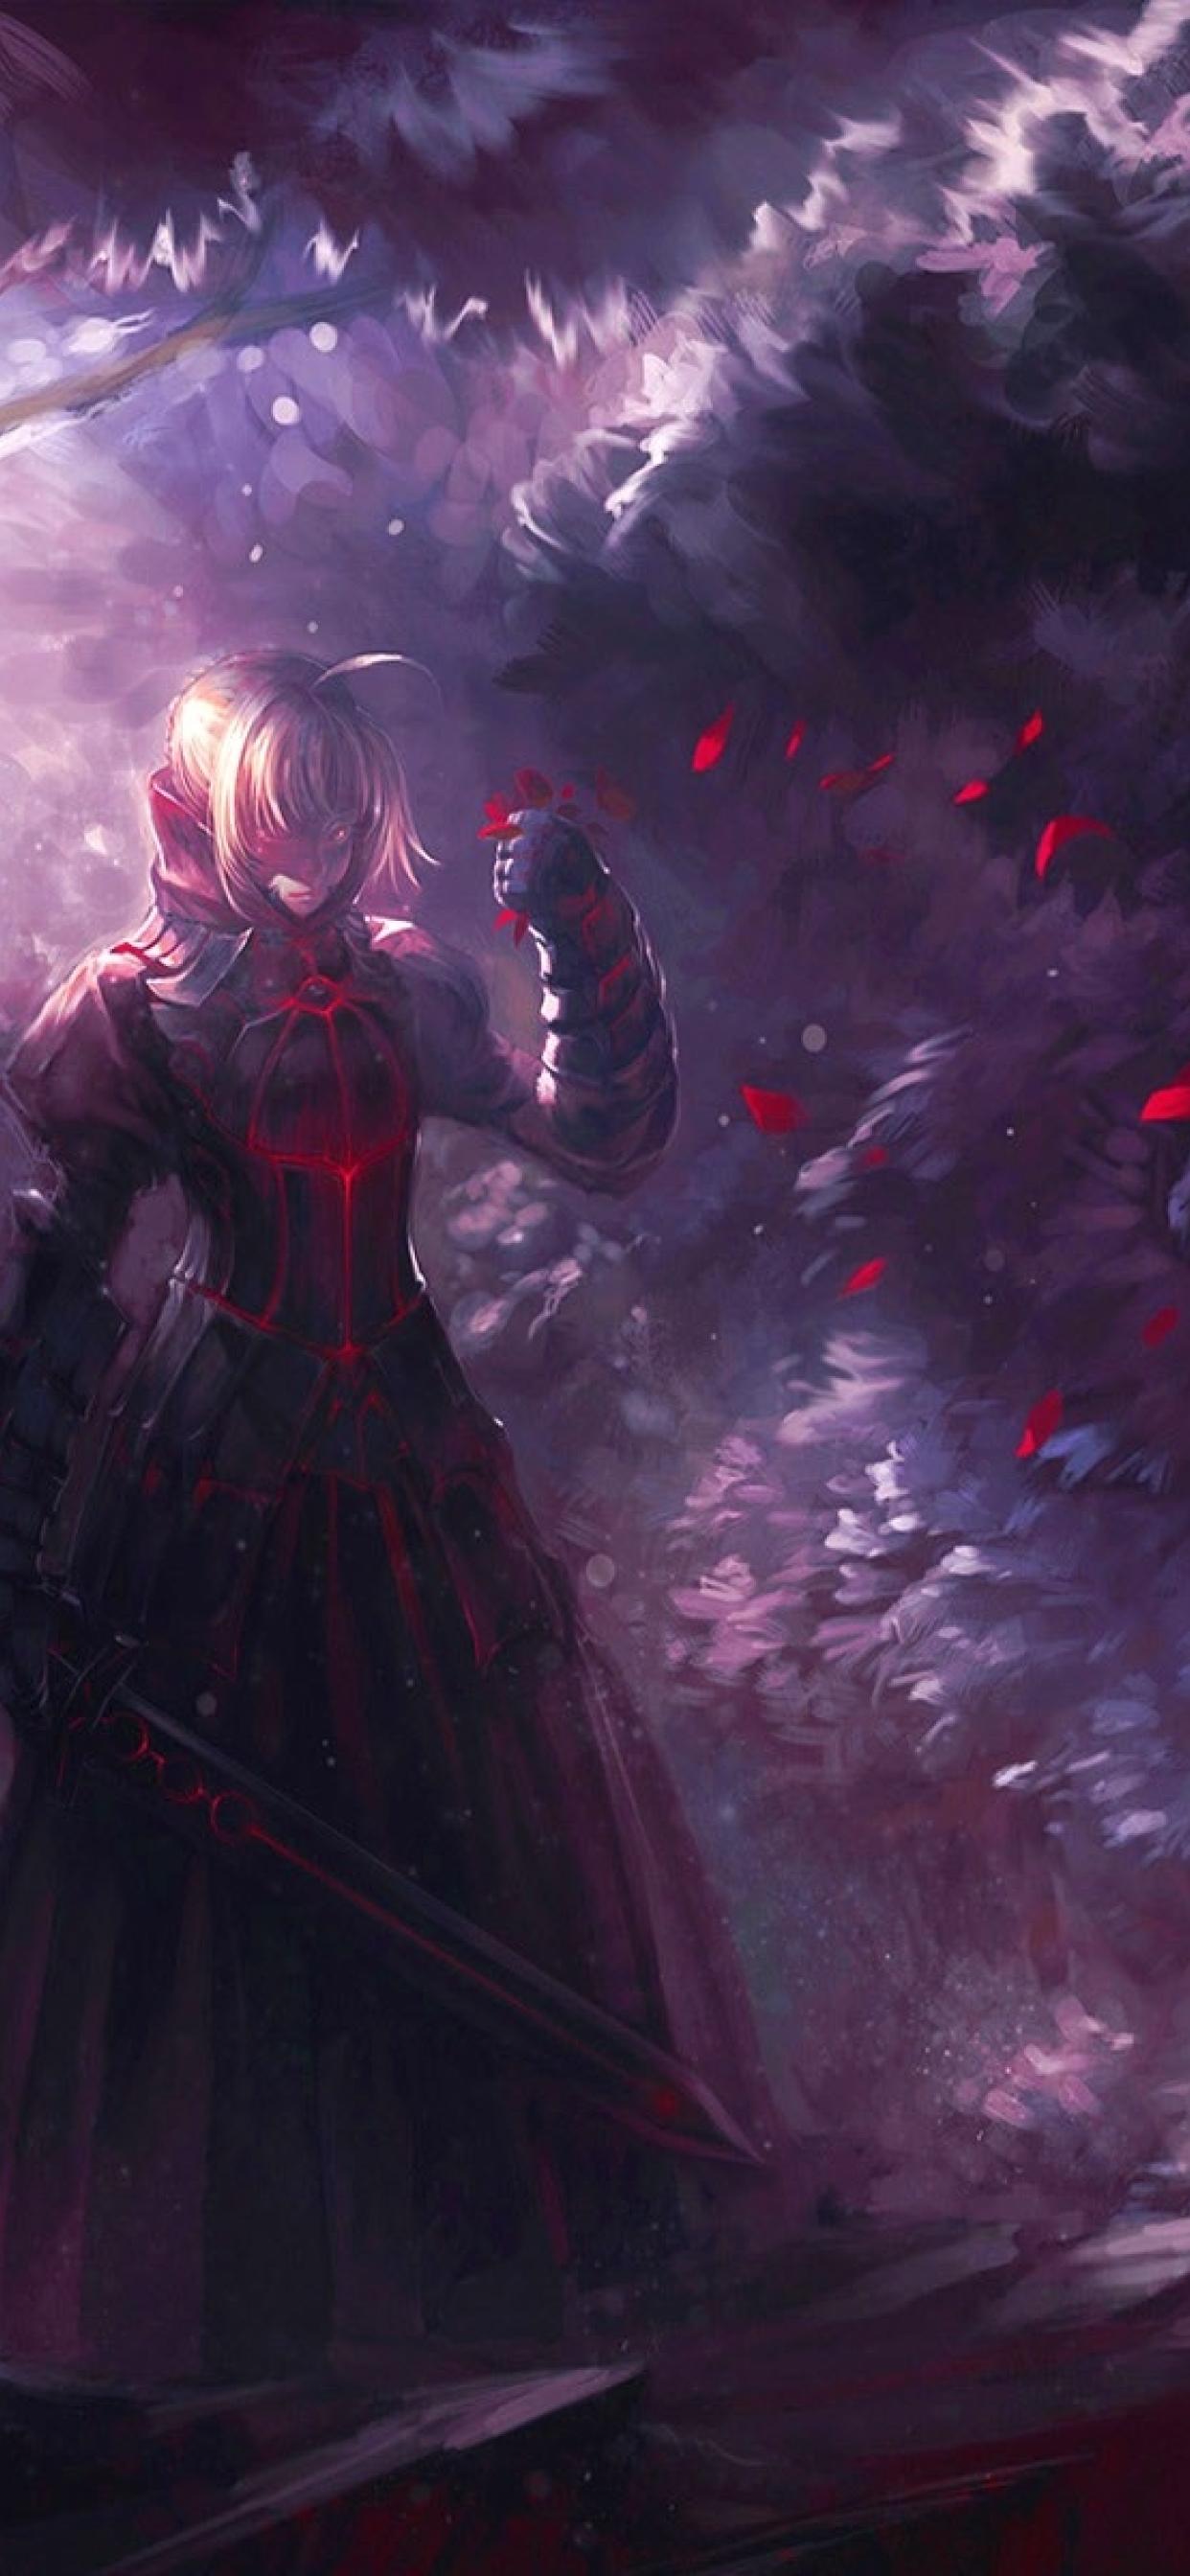 1242x2688 Fate Zero Saber Iphone Xs Max Wallpaper Hd Anime 4k